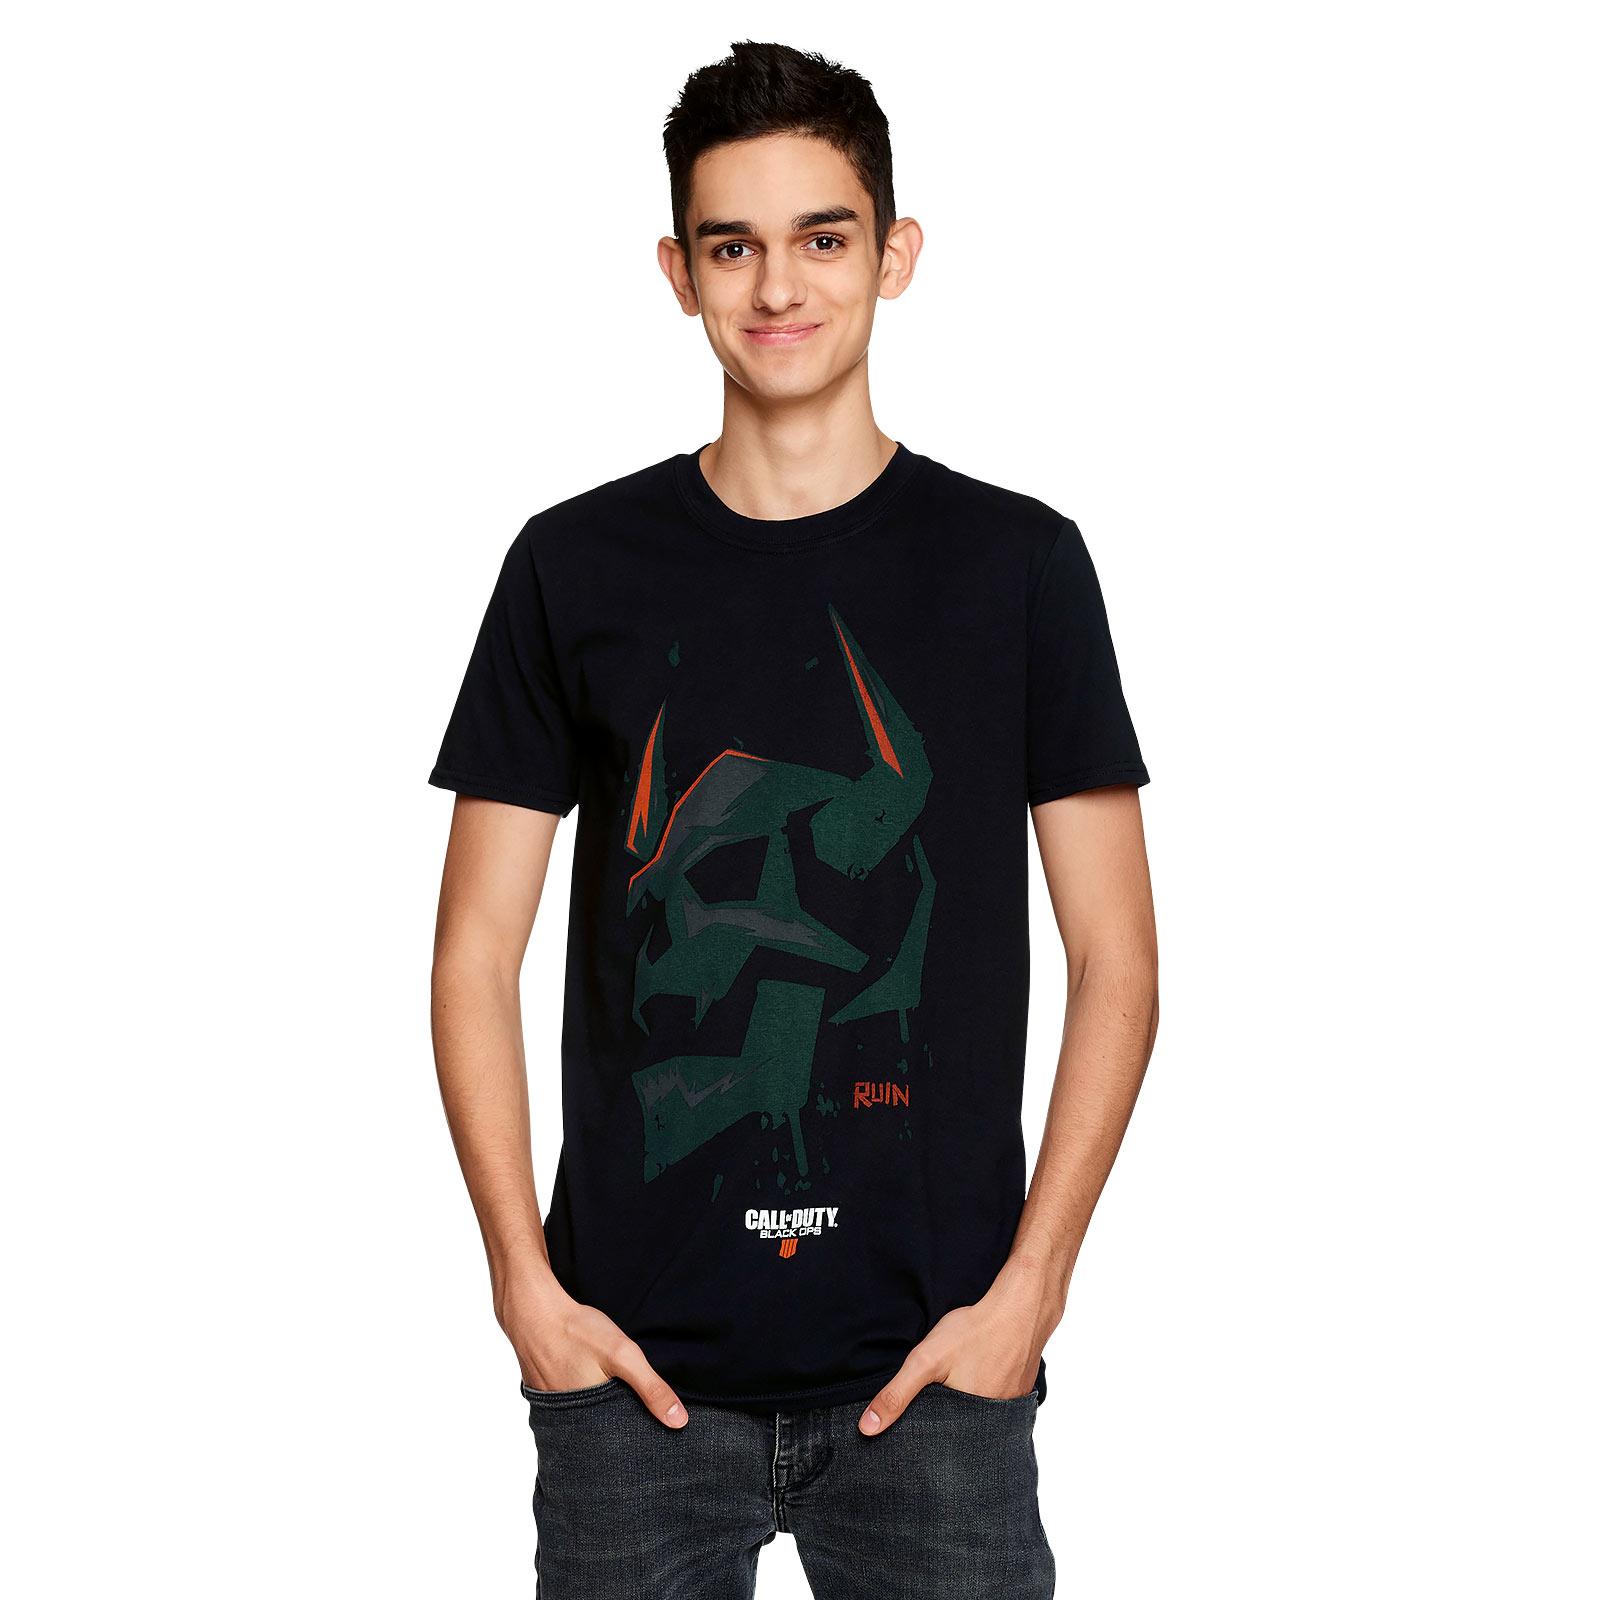 Call of Duty - Ruin Icon T-Shirt schwarz